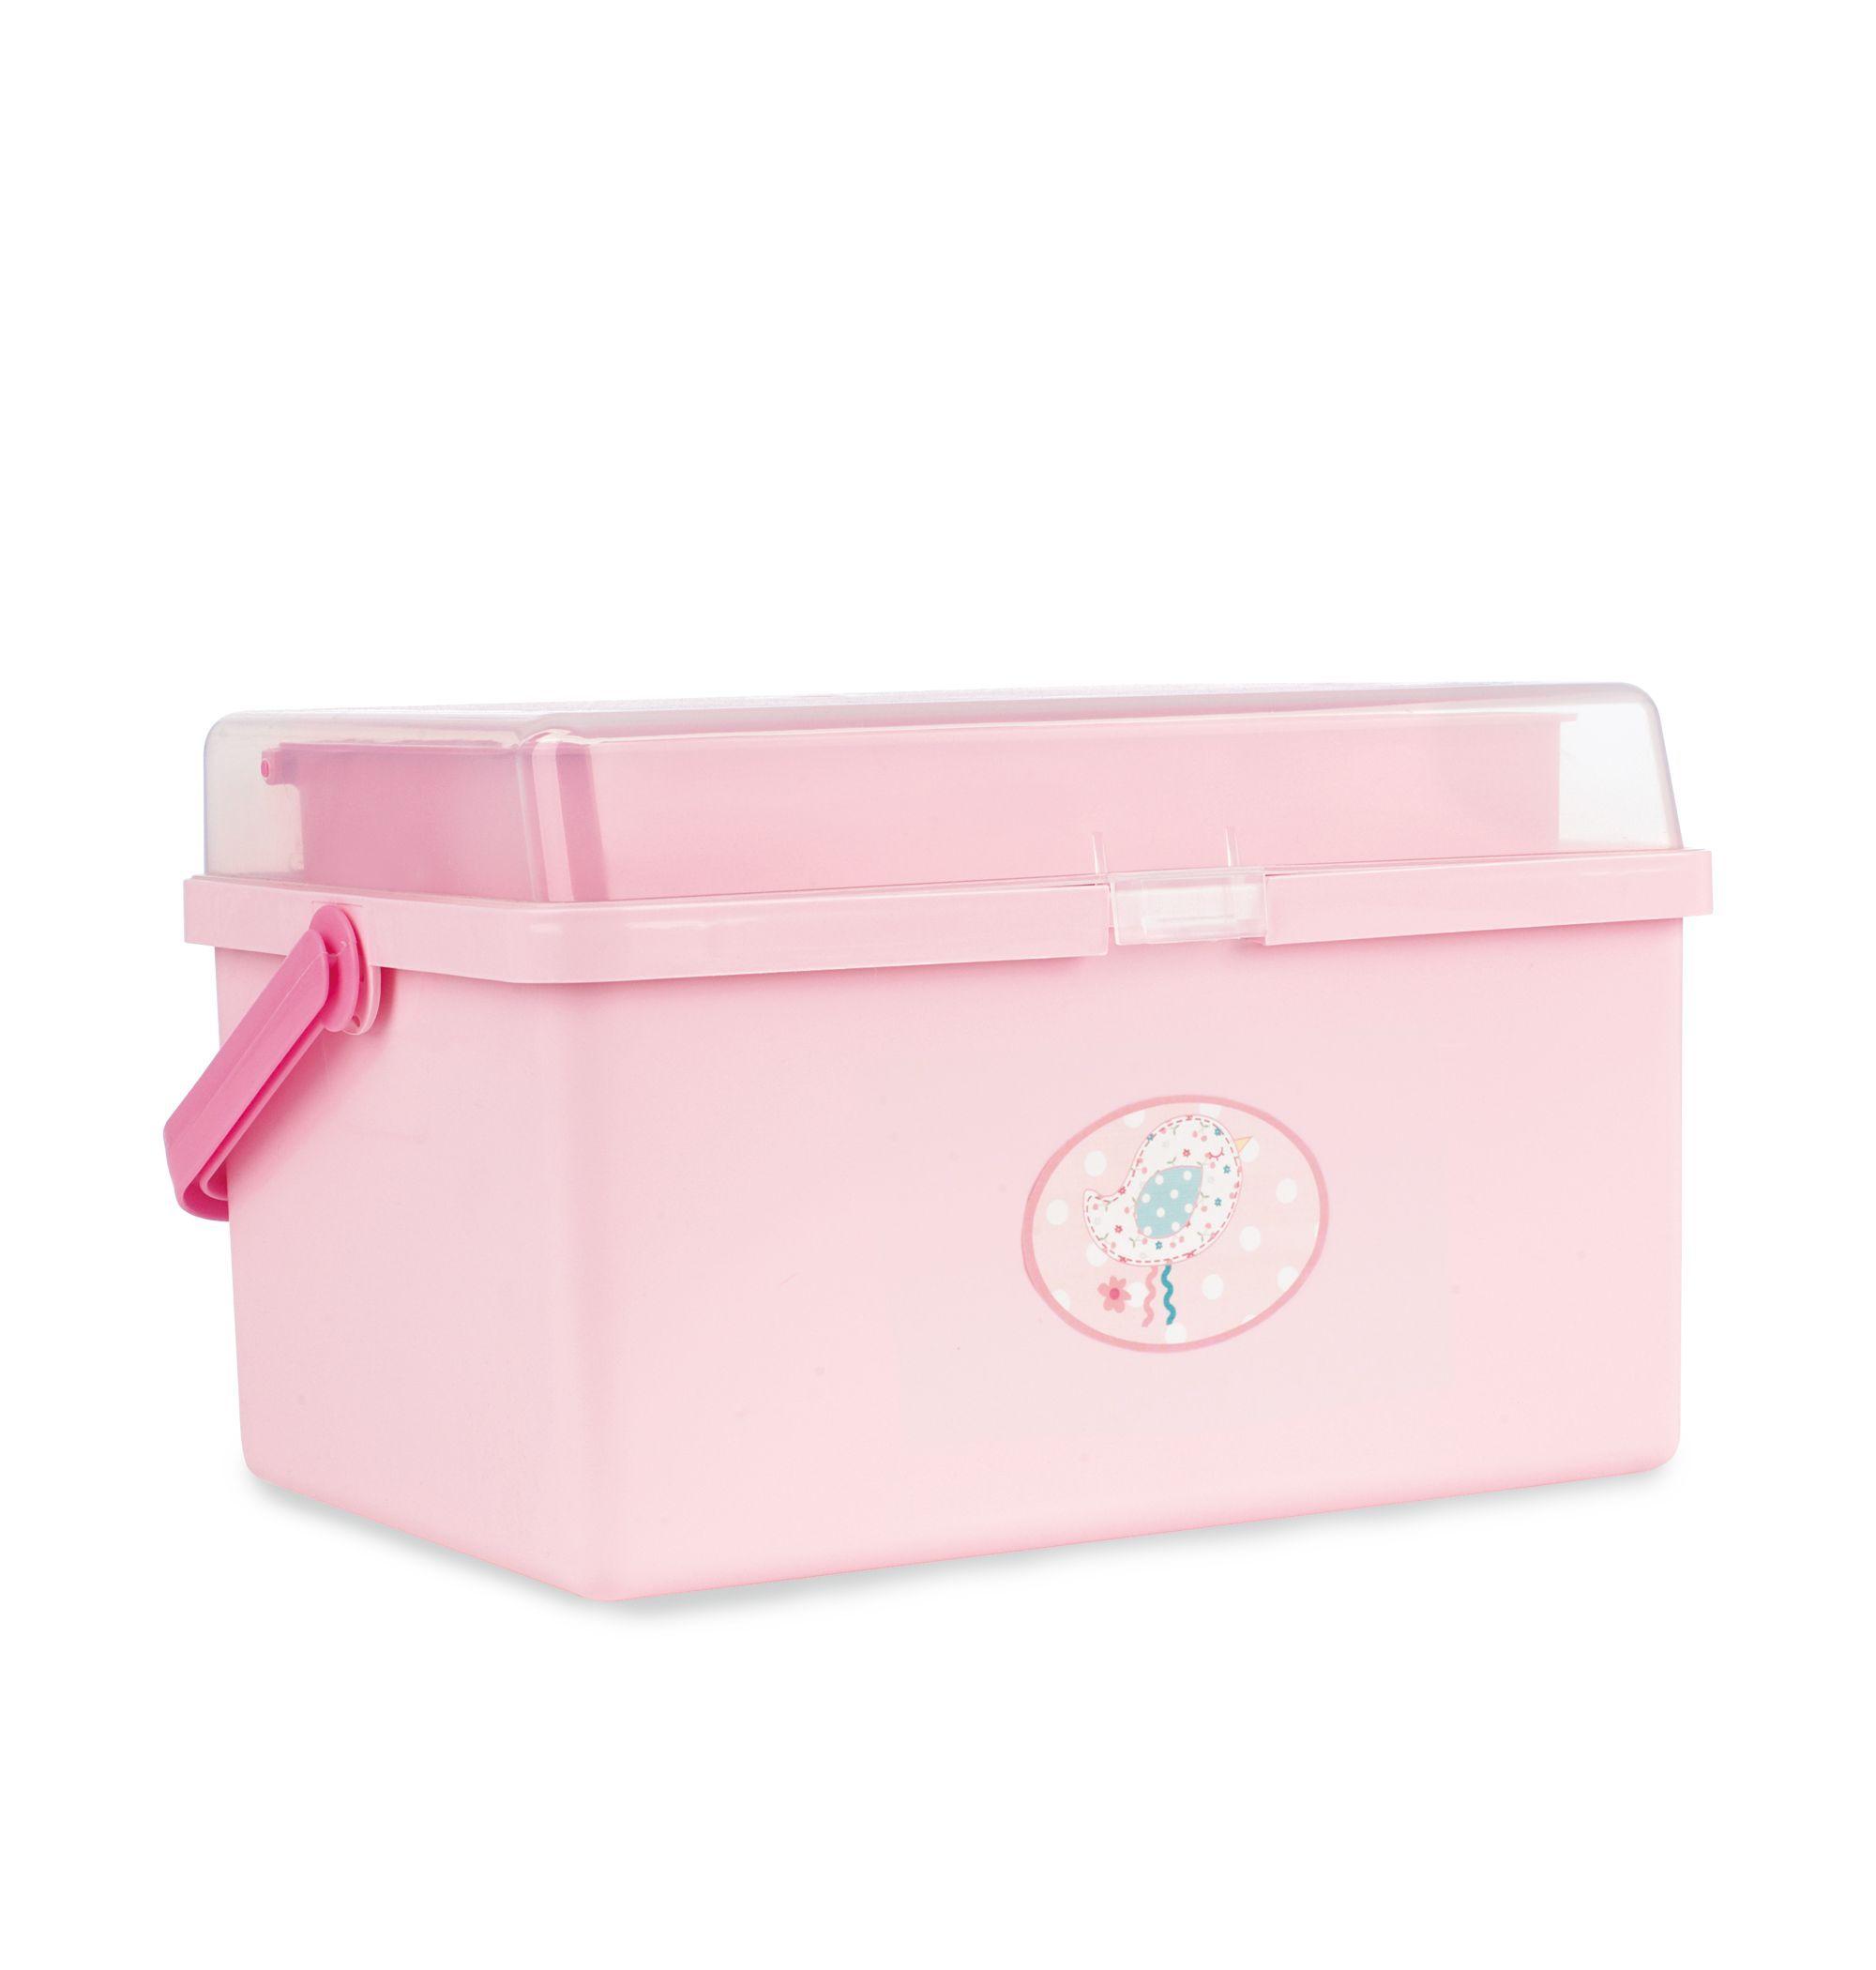 Mothercare Little Lane Bath Box Bath Nursery Bedding